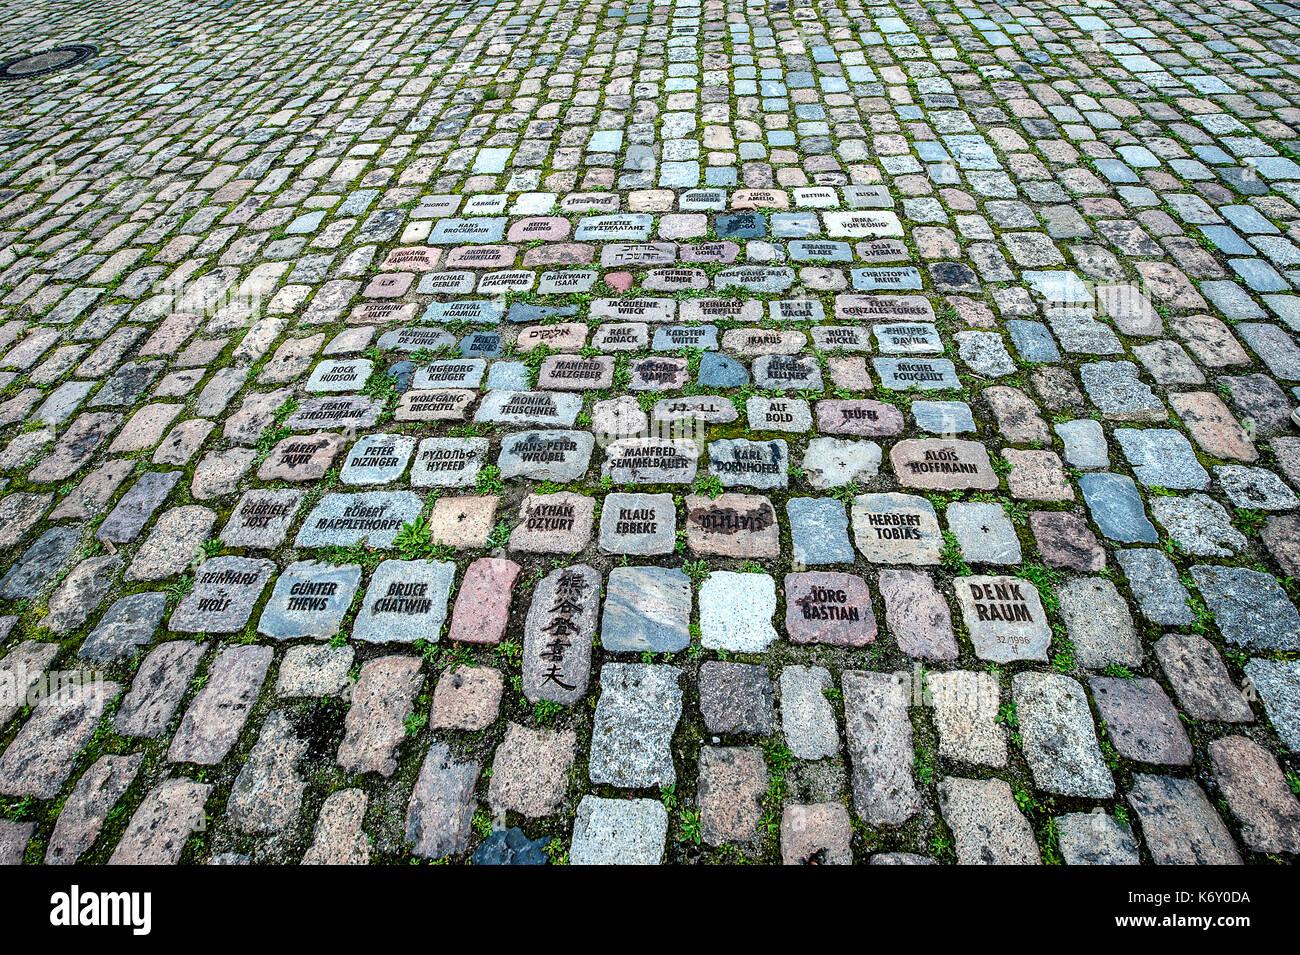 Alemania Berlín entrada hamburgher bahnhof museum - piso - Nombre de artistas o intelectuales Imagen De Stock